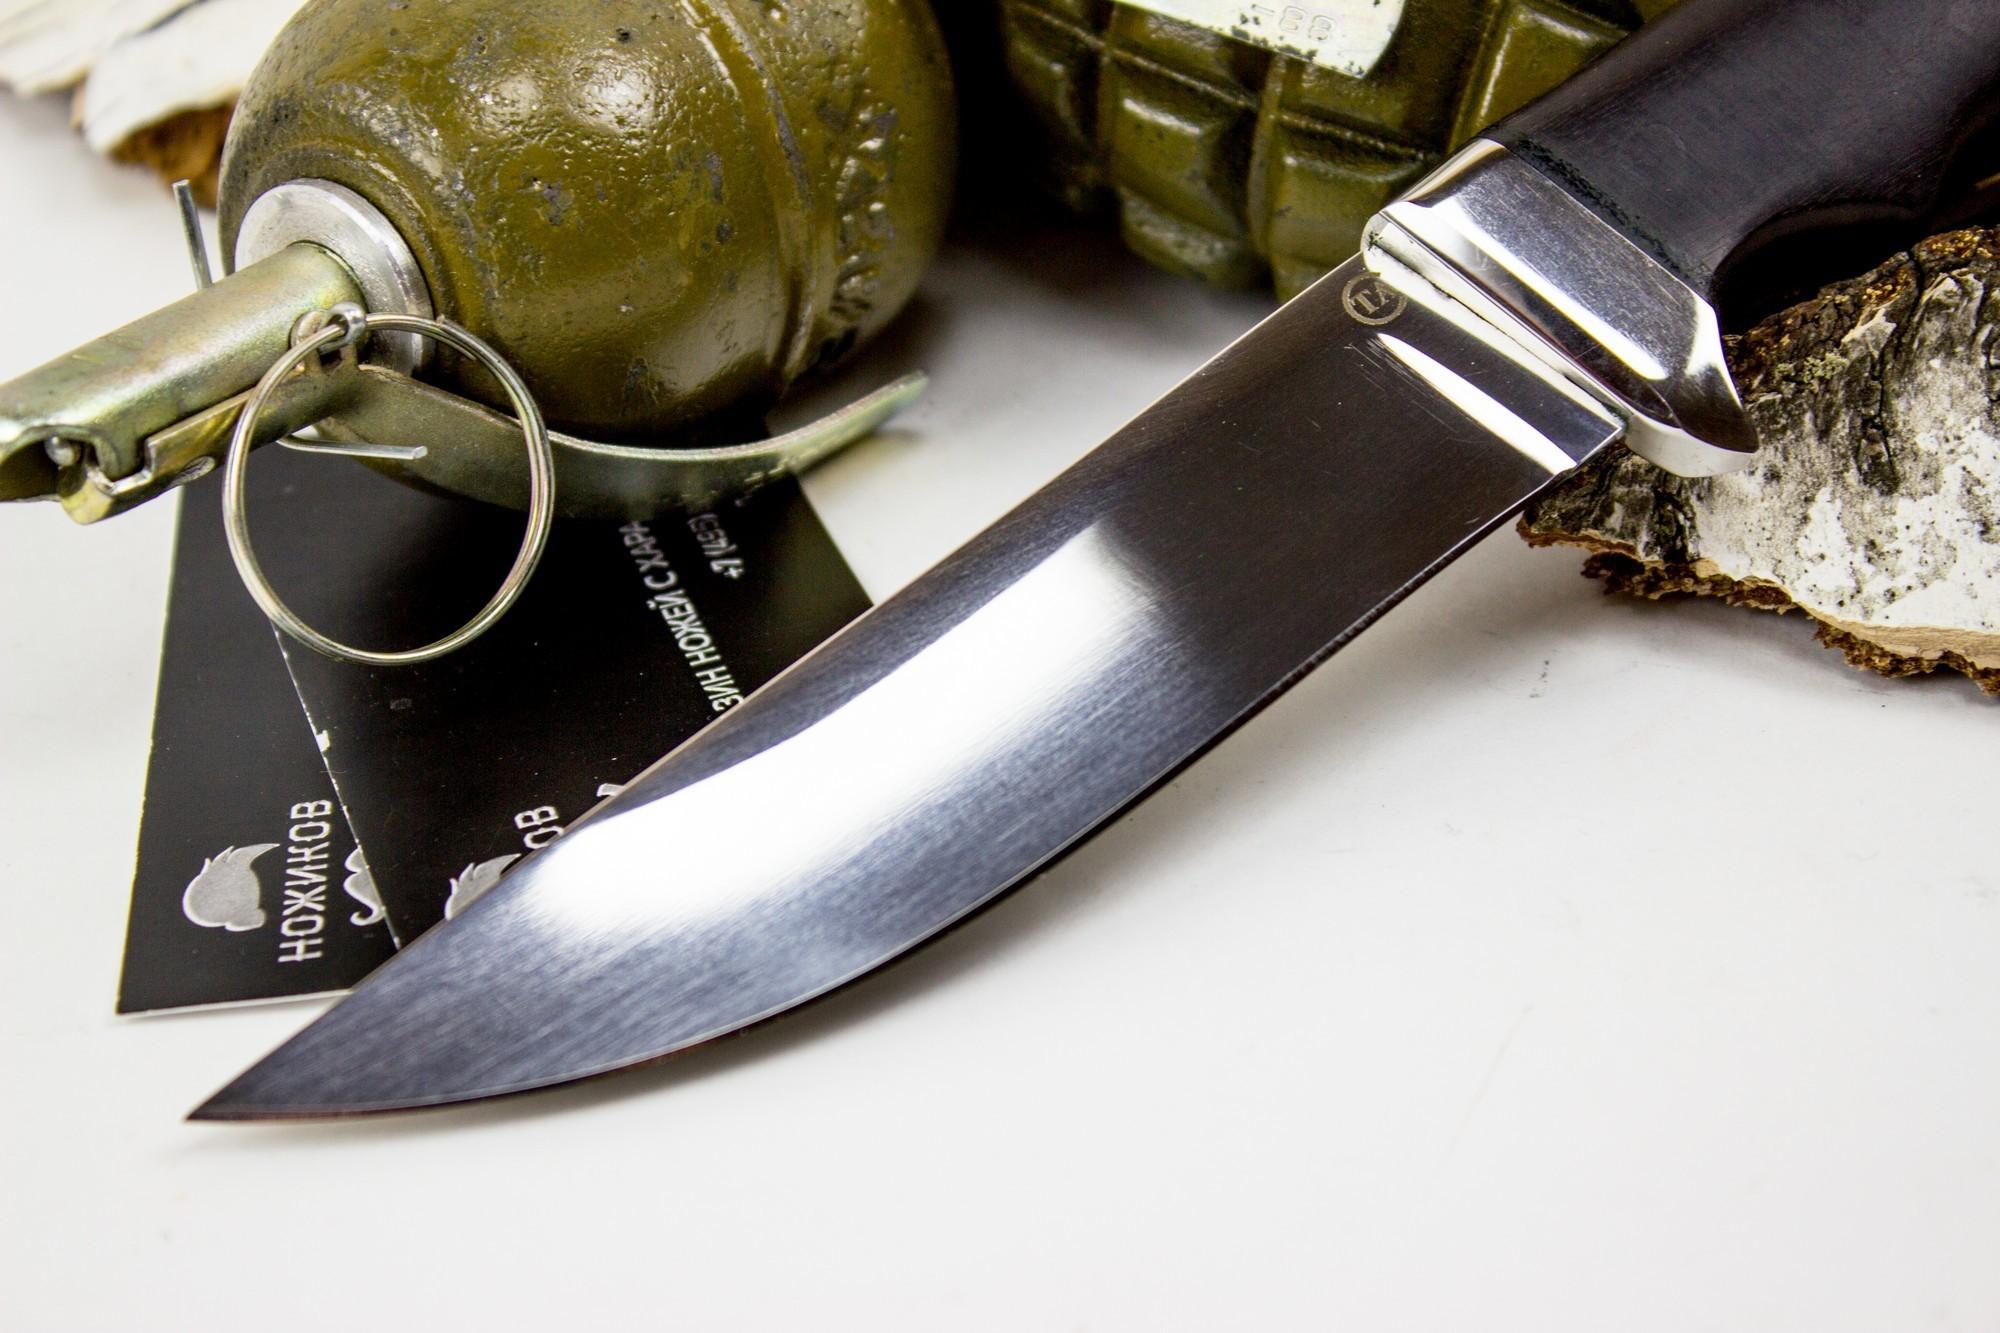 Фото 8 - Нож Кобра-3, сталь 95х18, дерево от Титов и Солдатова